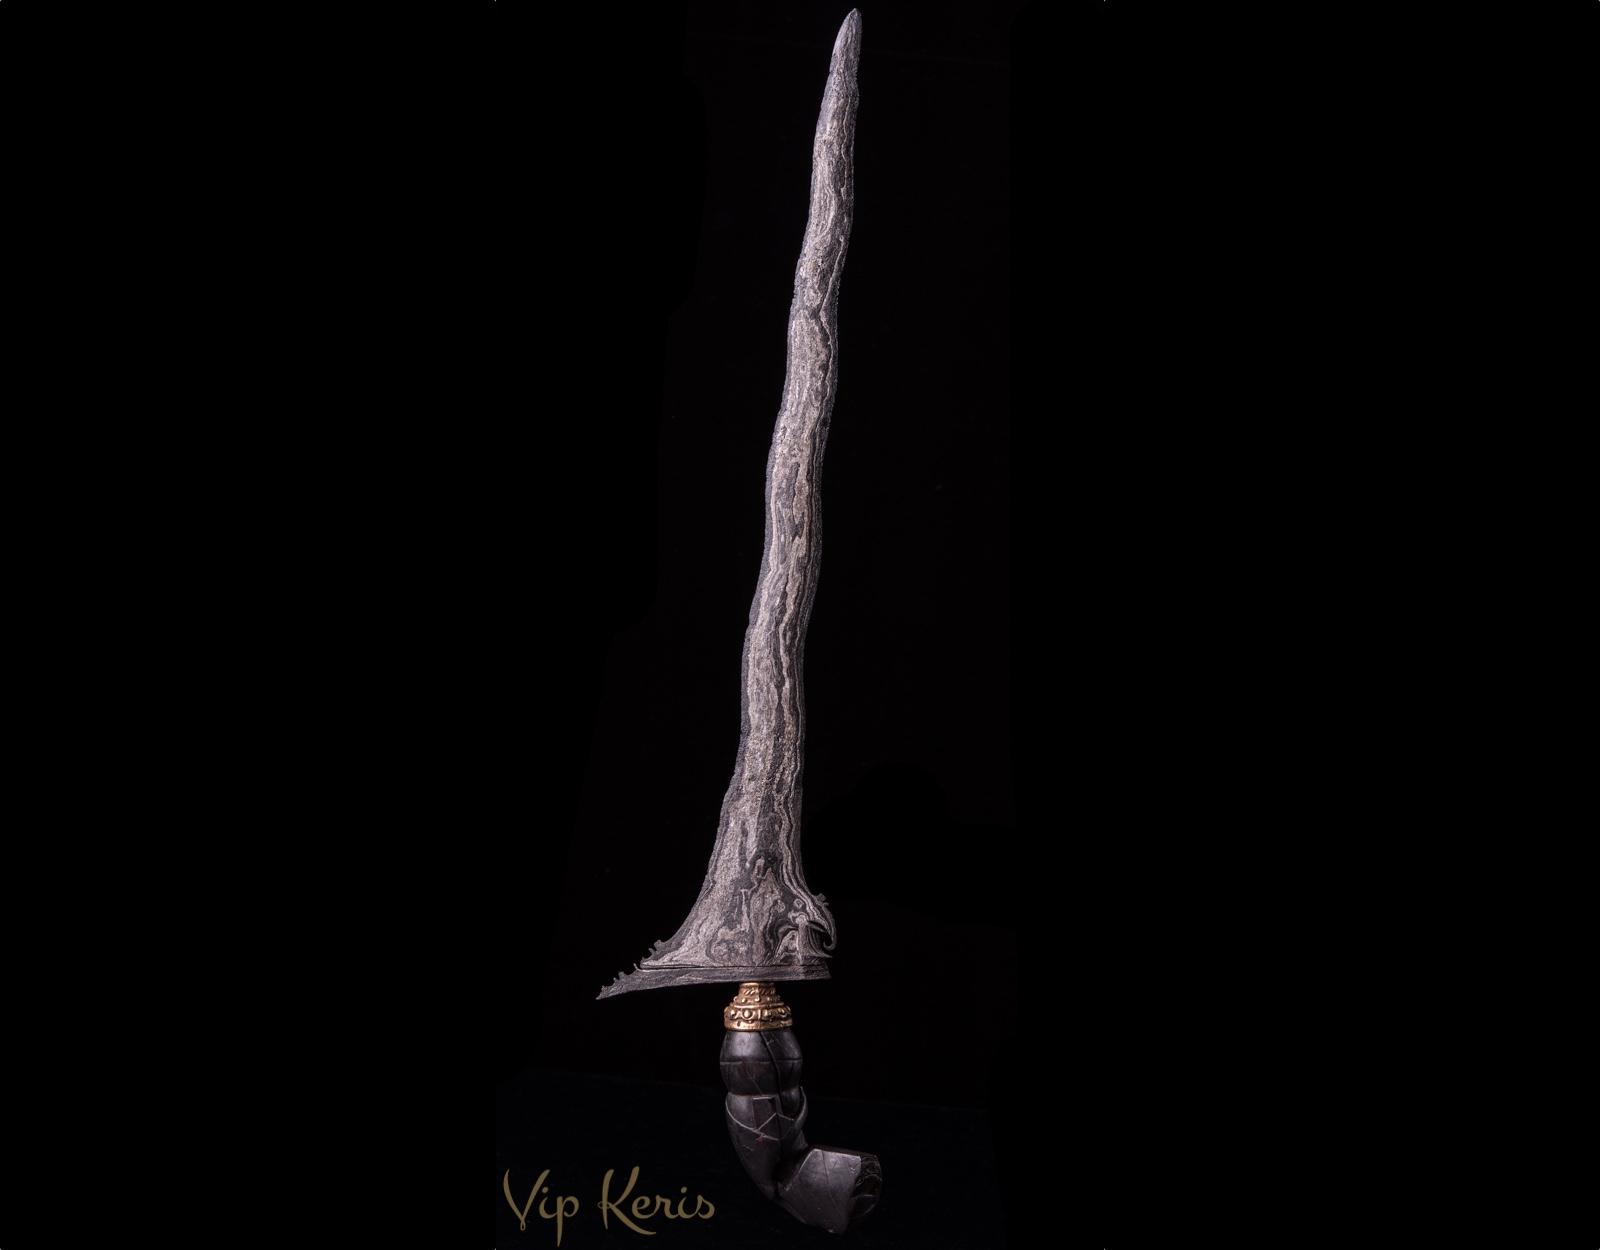 Нож Крис Sempono, девять изгибов. фото VipKeris